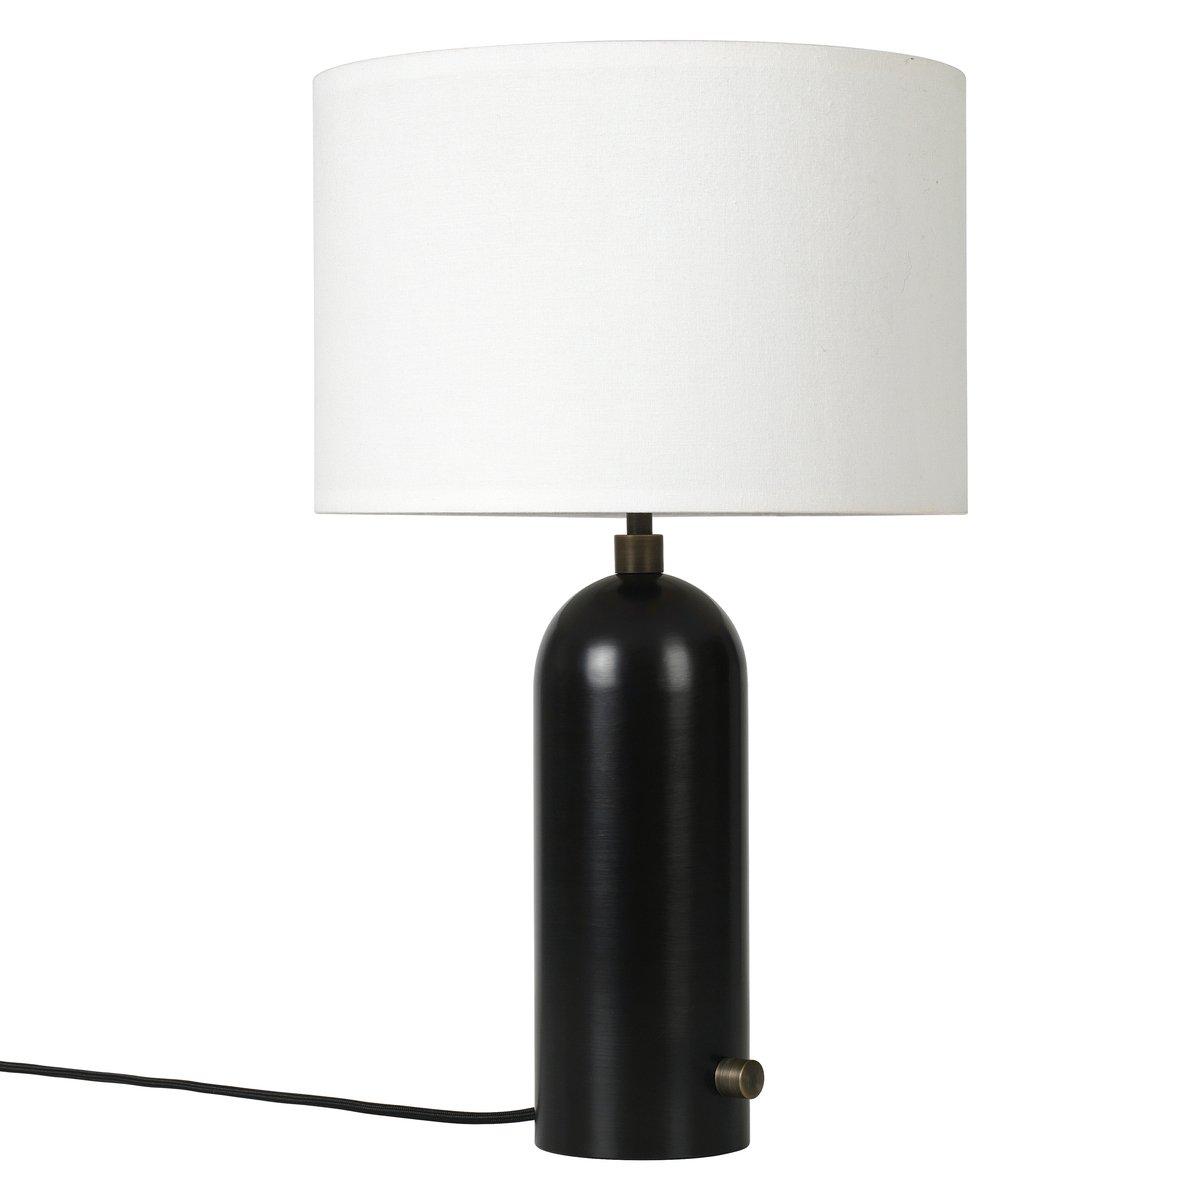 Gubi gravity table lamp small black steel finnish design shop